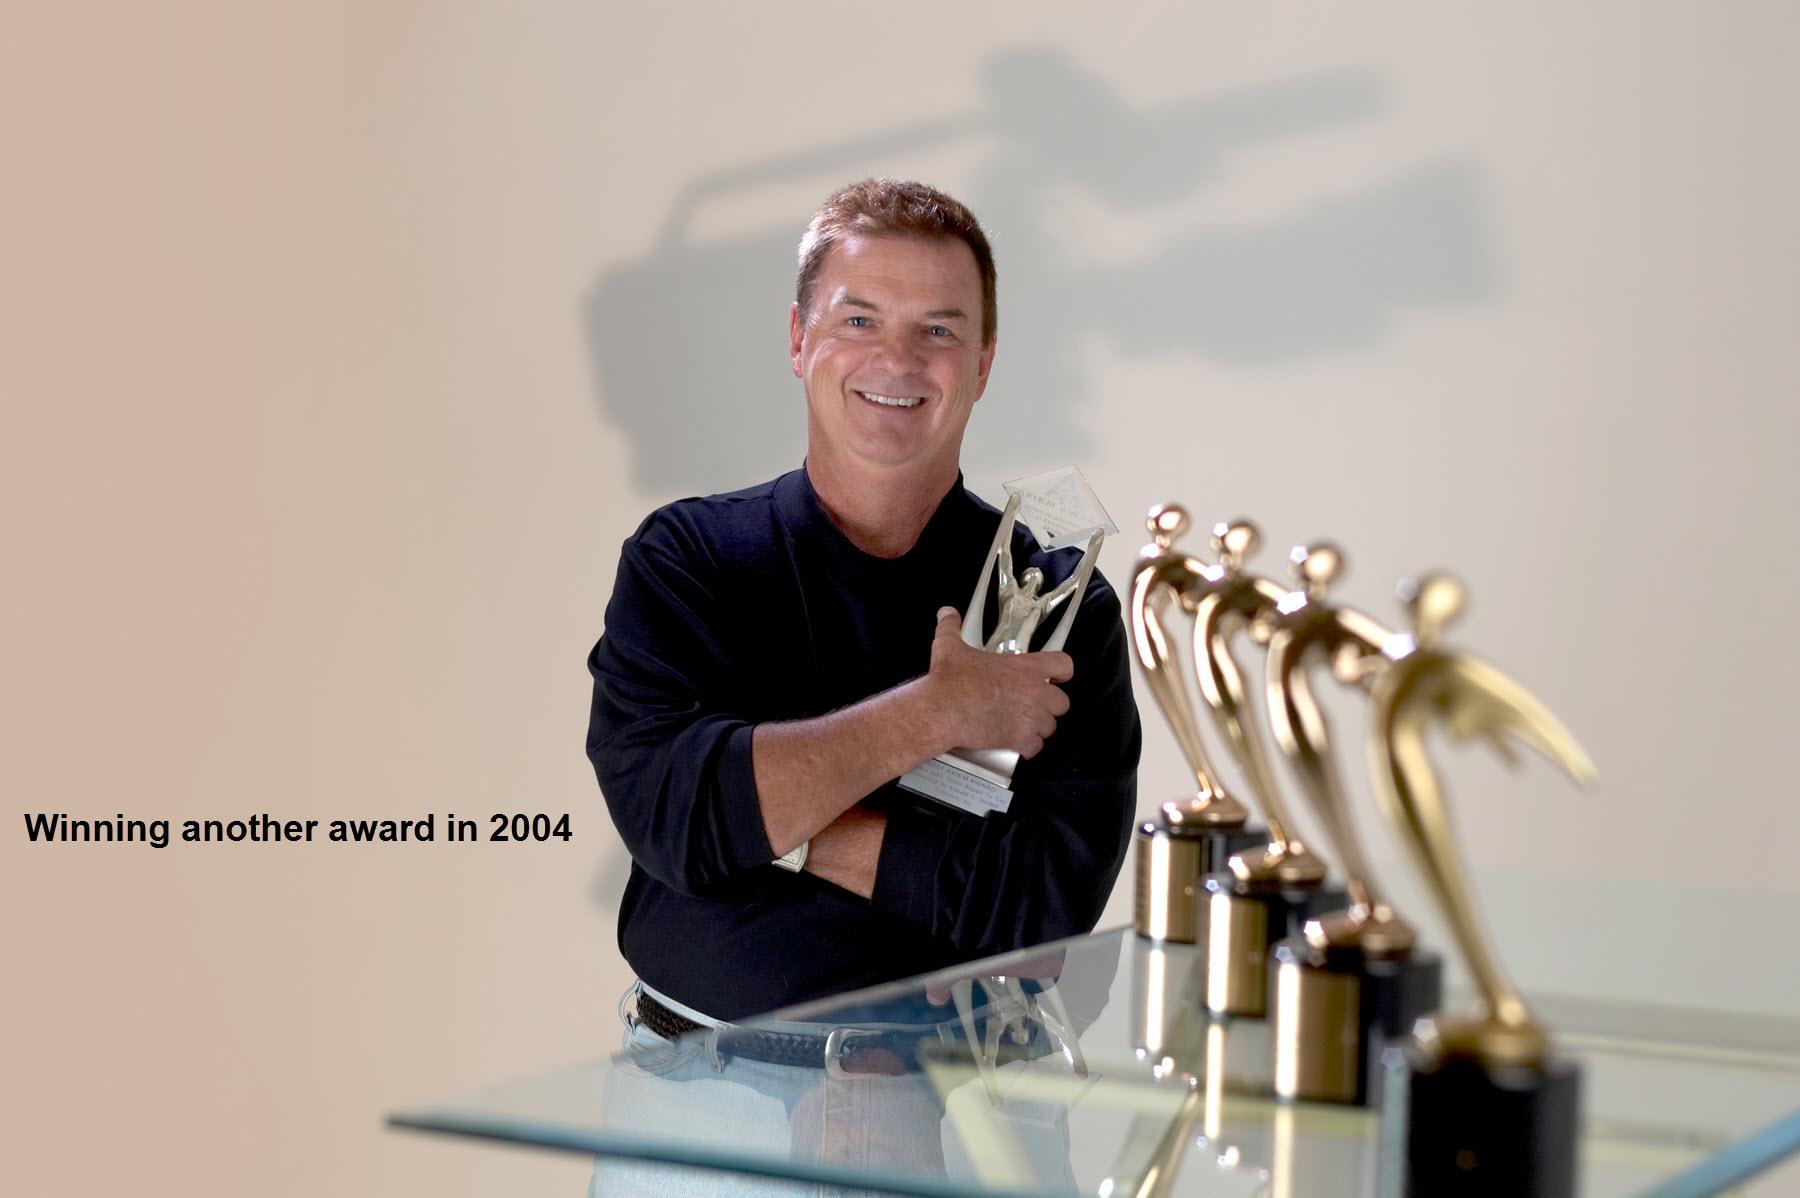 Corporate Video Production Awards   Ron Strobel